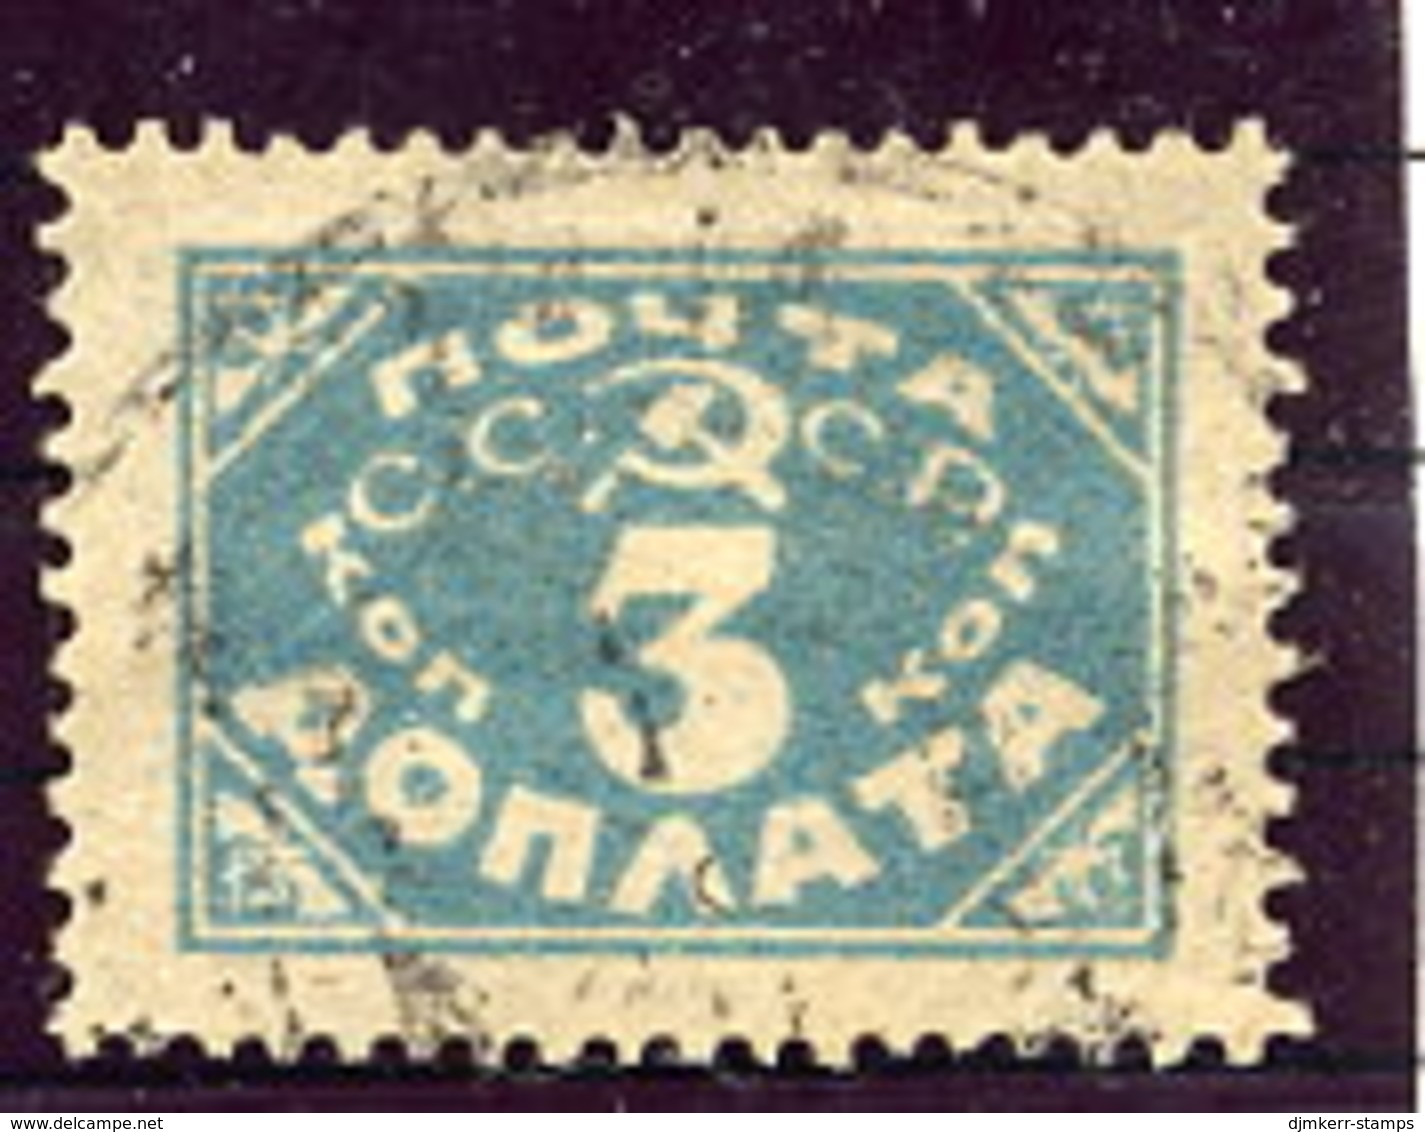 SOVIET UNION 1925 Postage Due 3 K. Perforated 14¾:14¼ Used  Michel 13 I B - Postage Due